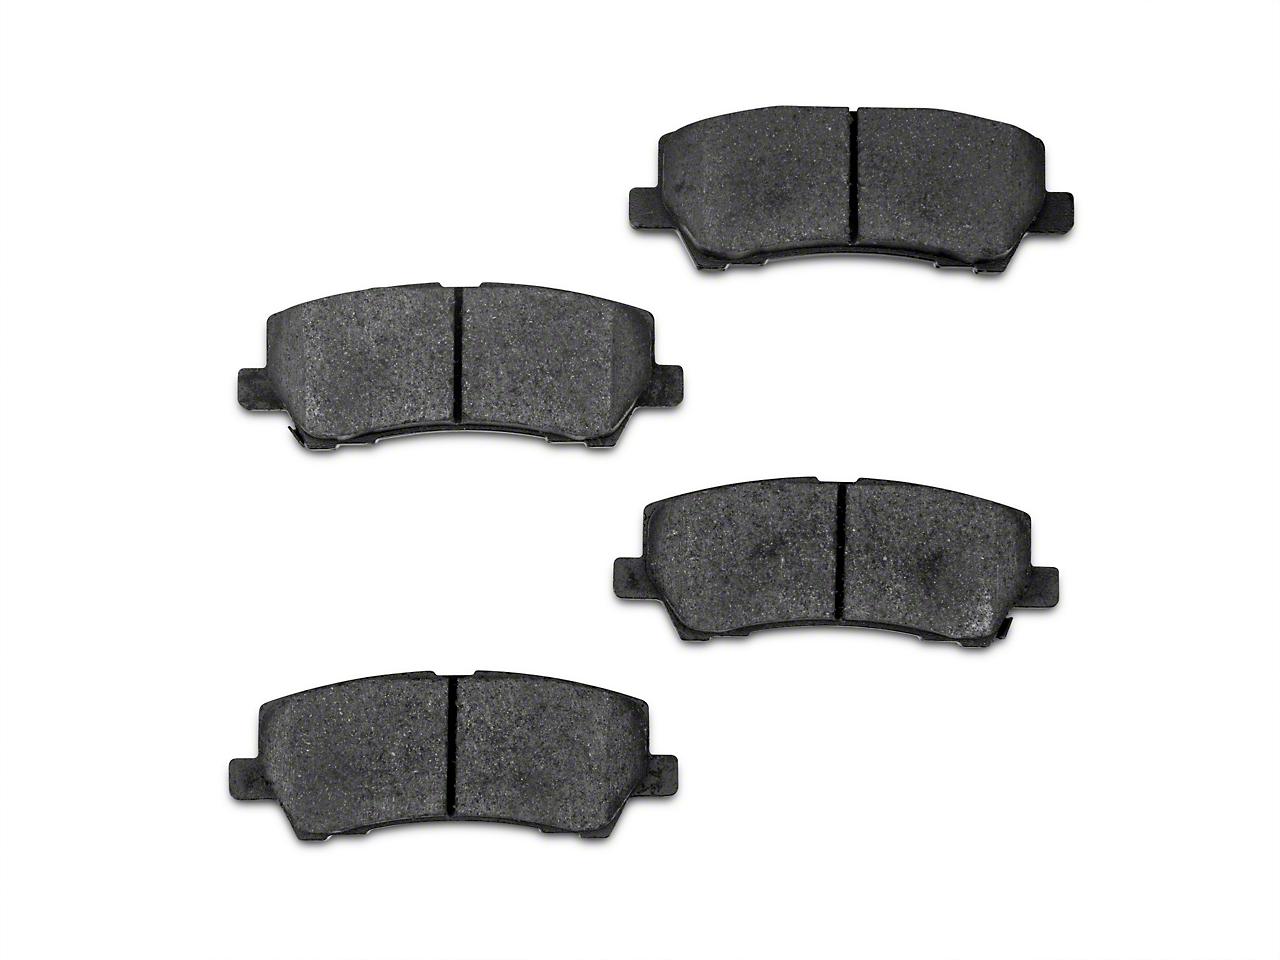 Stillen Metal Matrix Brake Pads - Rear Pair (15-17 GT, EcoBoost, V6)